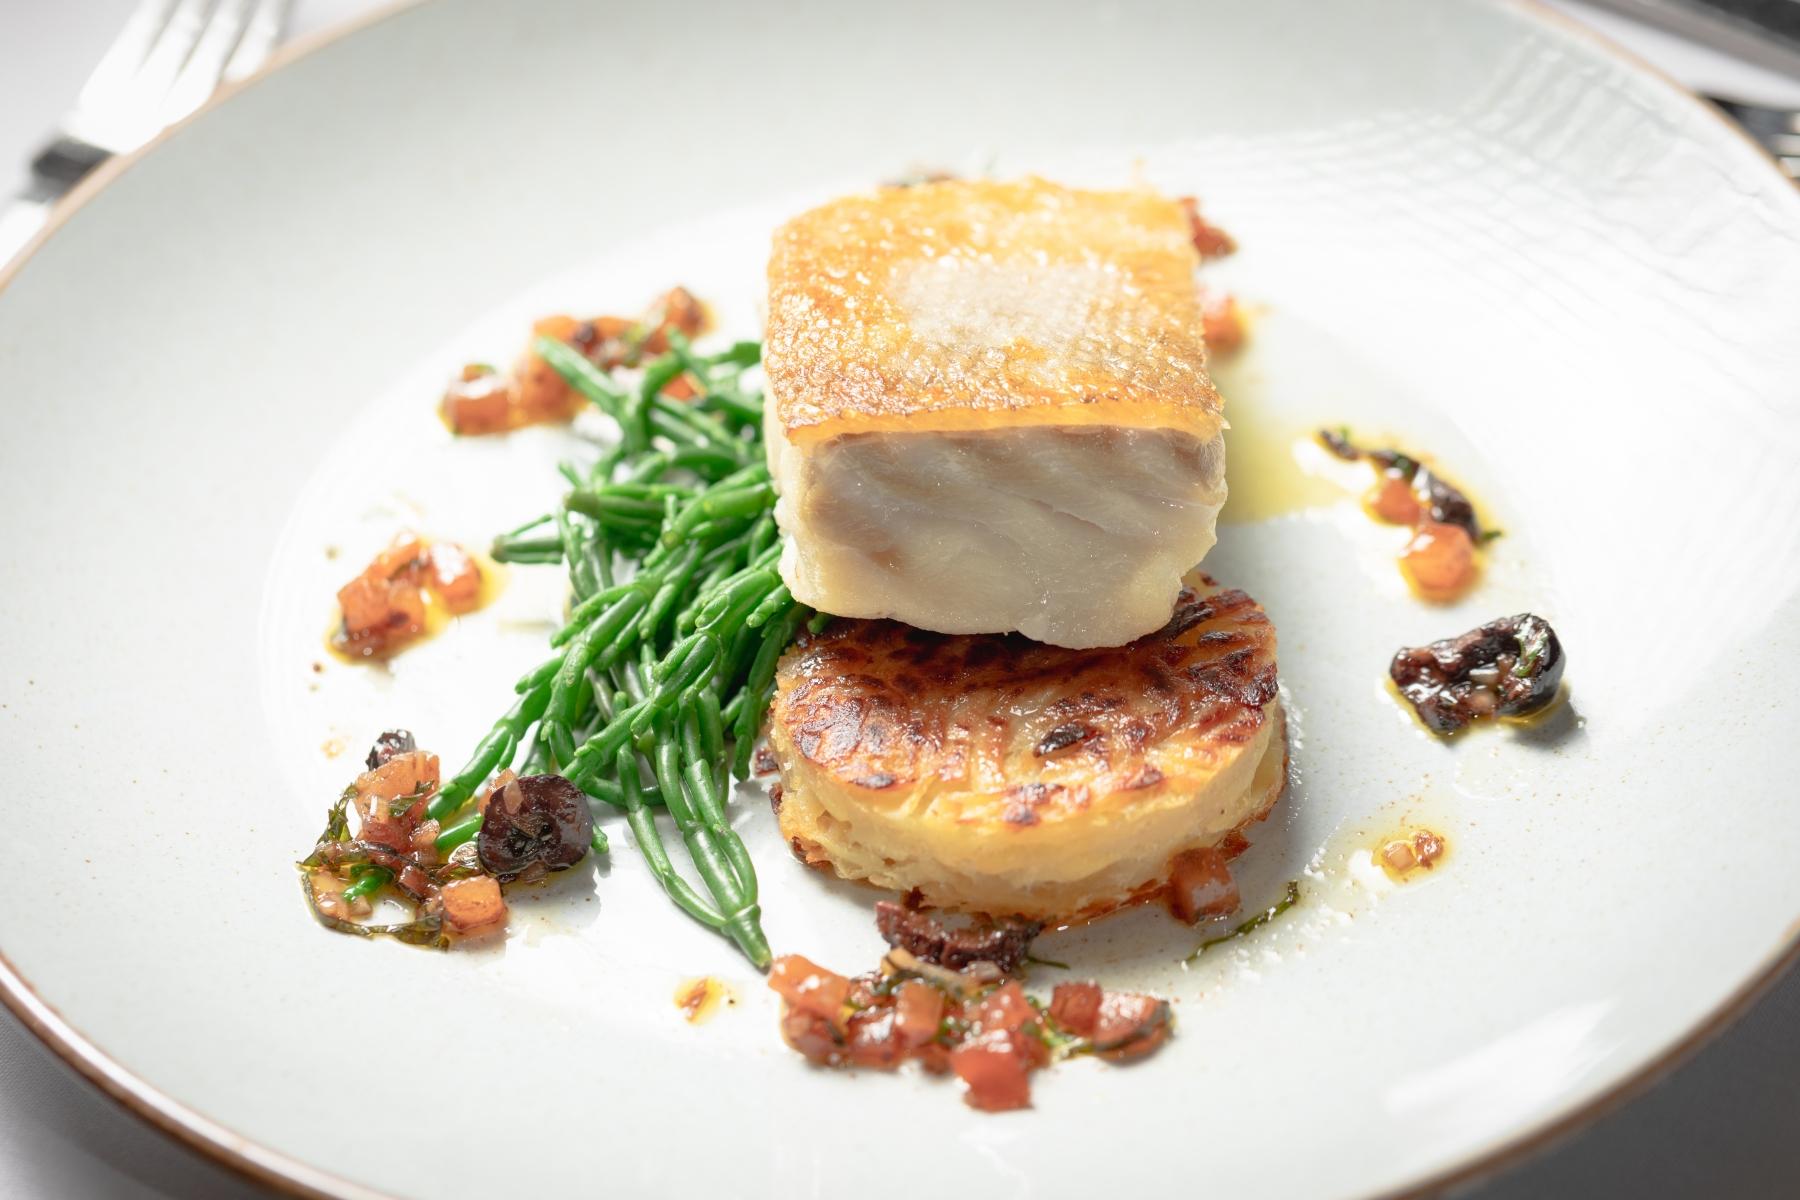 Doxford-Barns-Main-Pan-fried-Cod-potato-rosti-sauce-vierge-Stephen-Beecroft-Photography